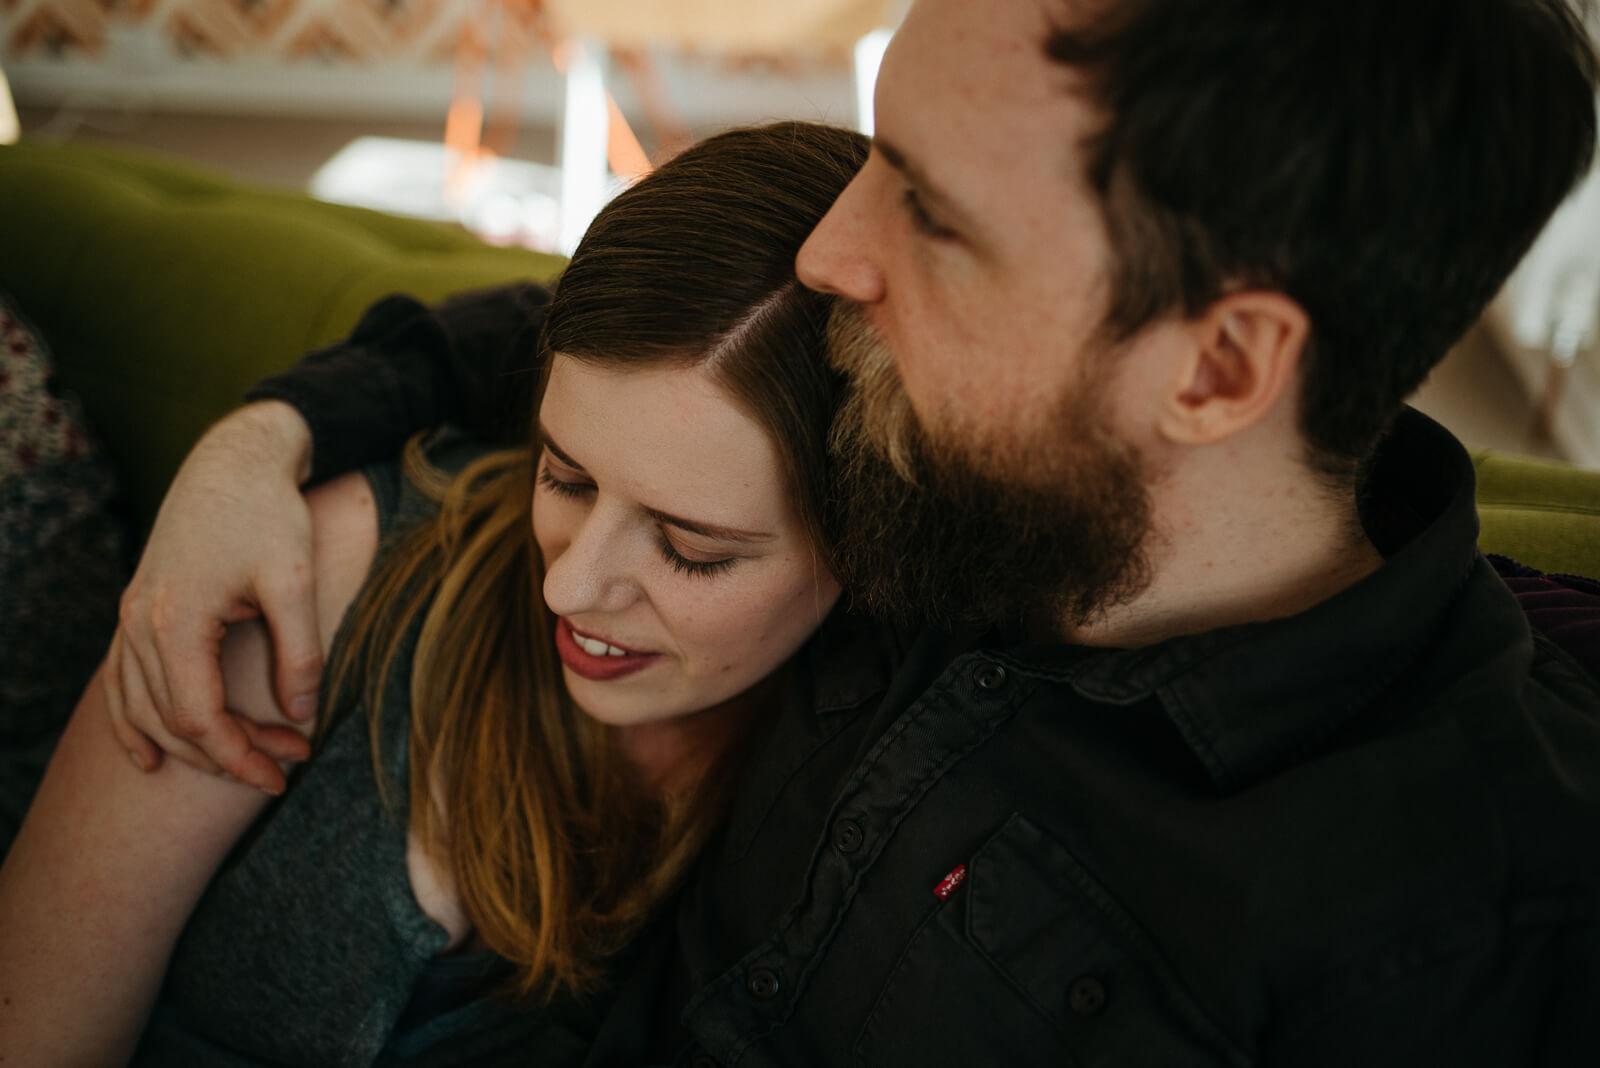 Sarah cuddling up to Gary during Glasgow couple shoot